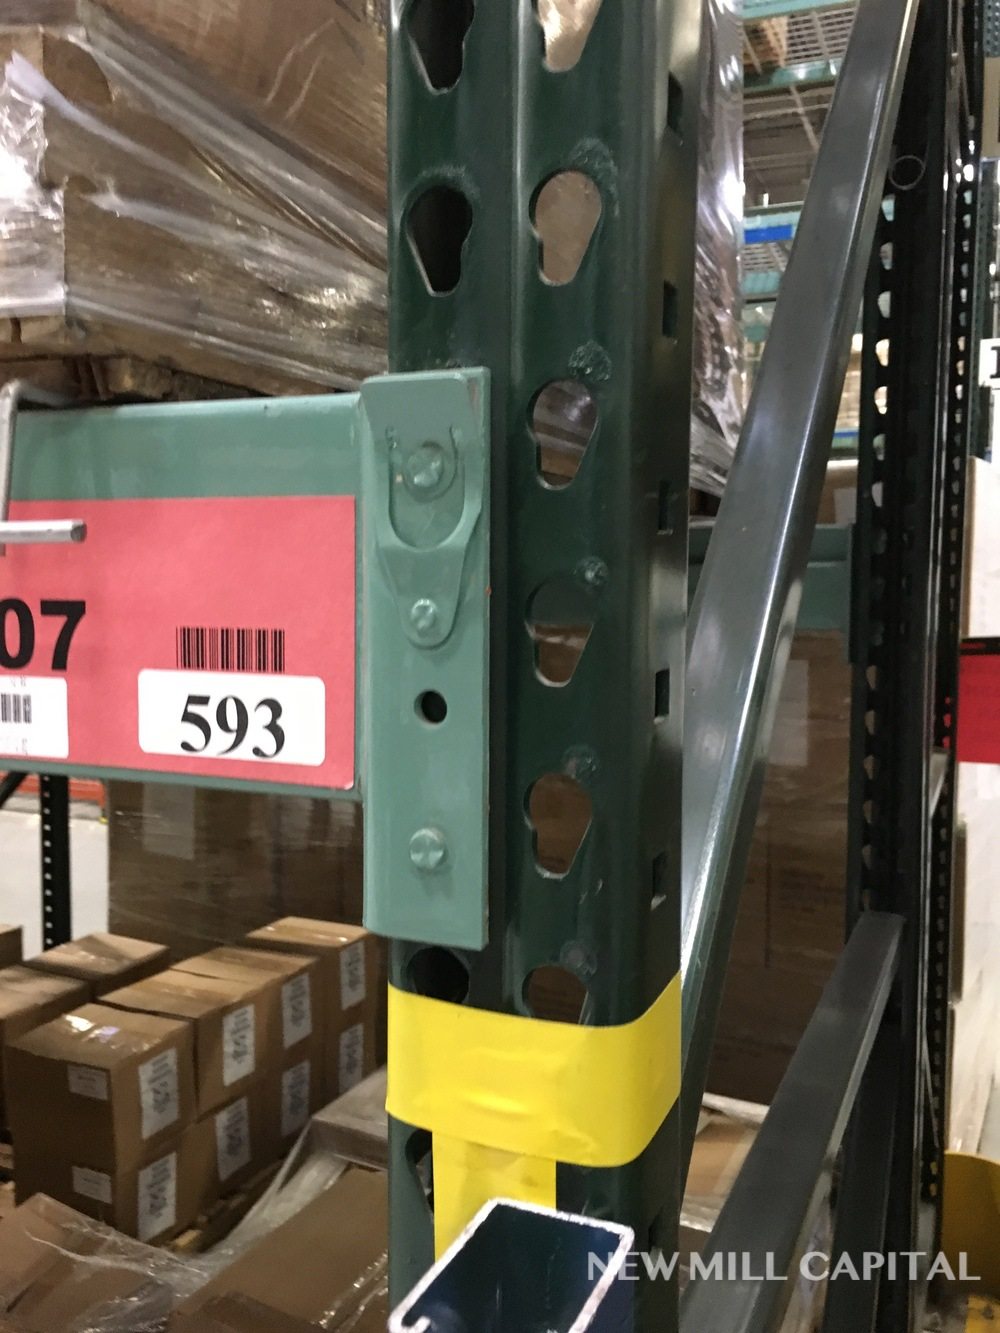 Lot 19 - Ridg-U-Rak Teardrop Pallet Racking, (32) Uprights (3in x 2.25in Columns, | Rig: See Lot Description